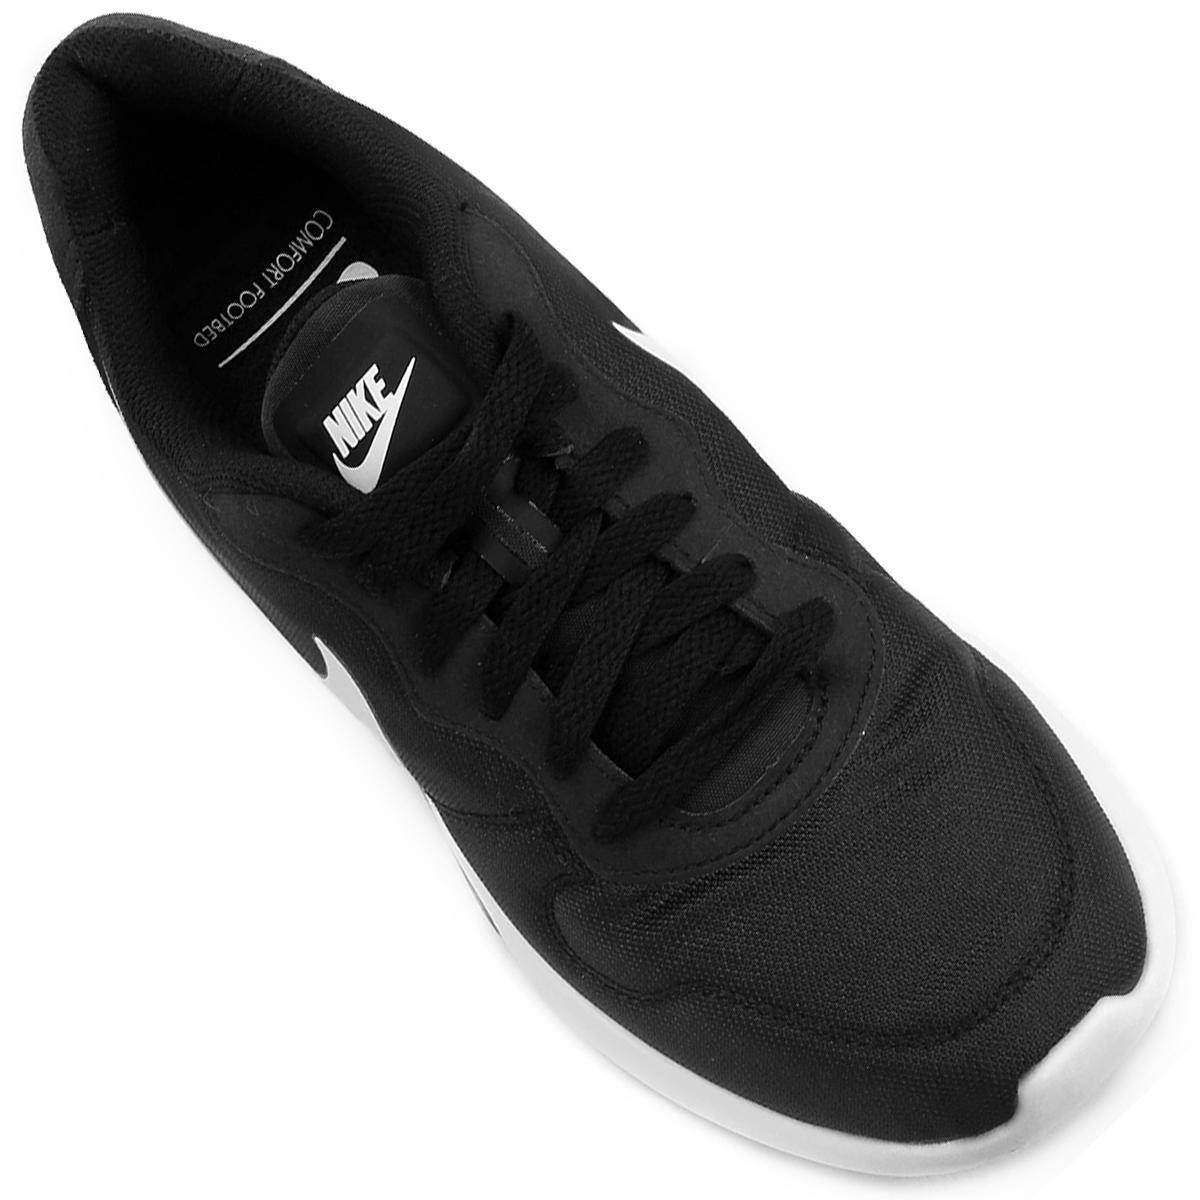 Tênis Nike Md Runner 2 Lw Masculino - Compre Agora  451fbfefadf13